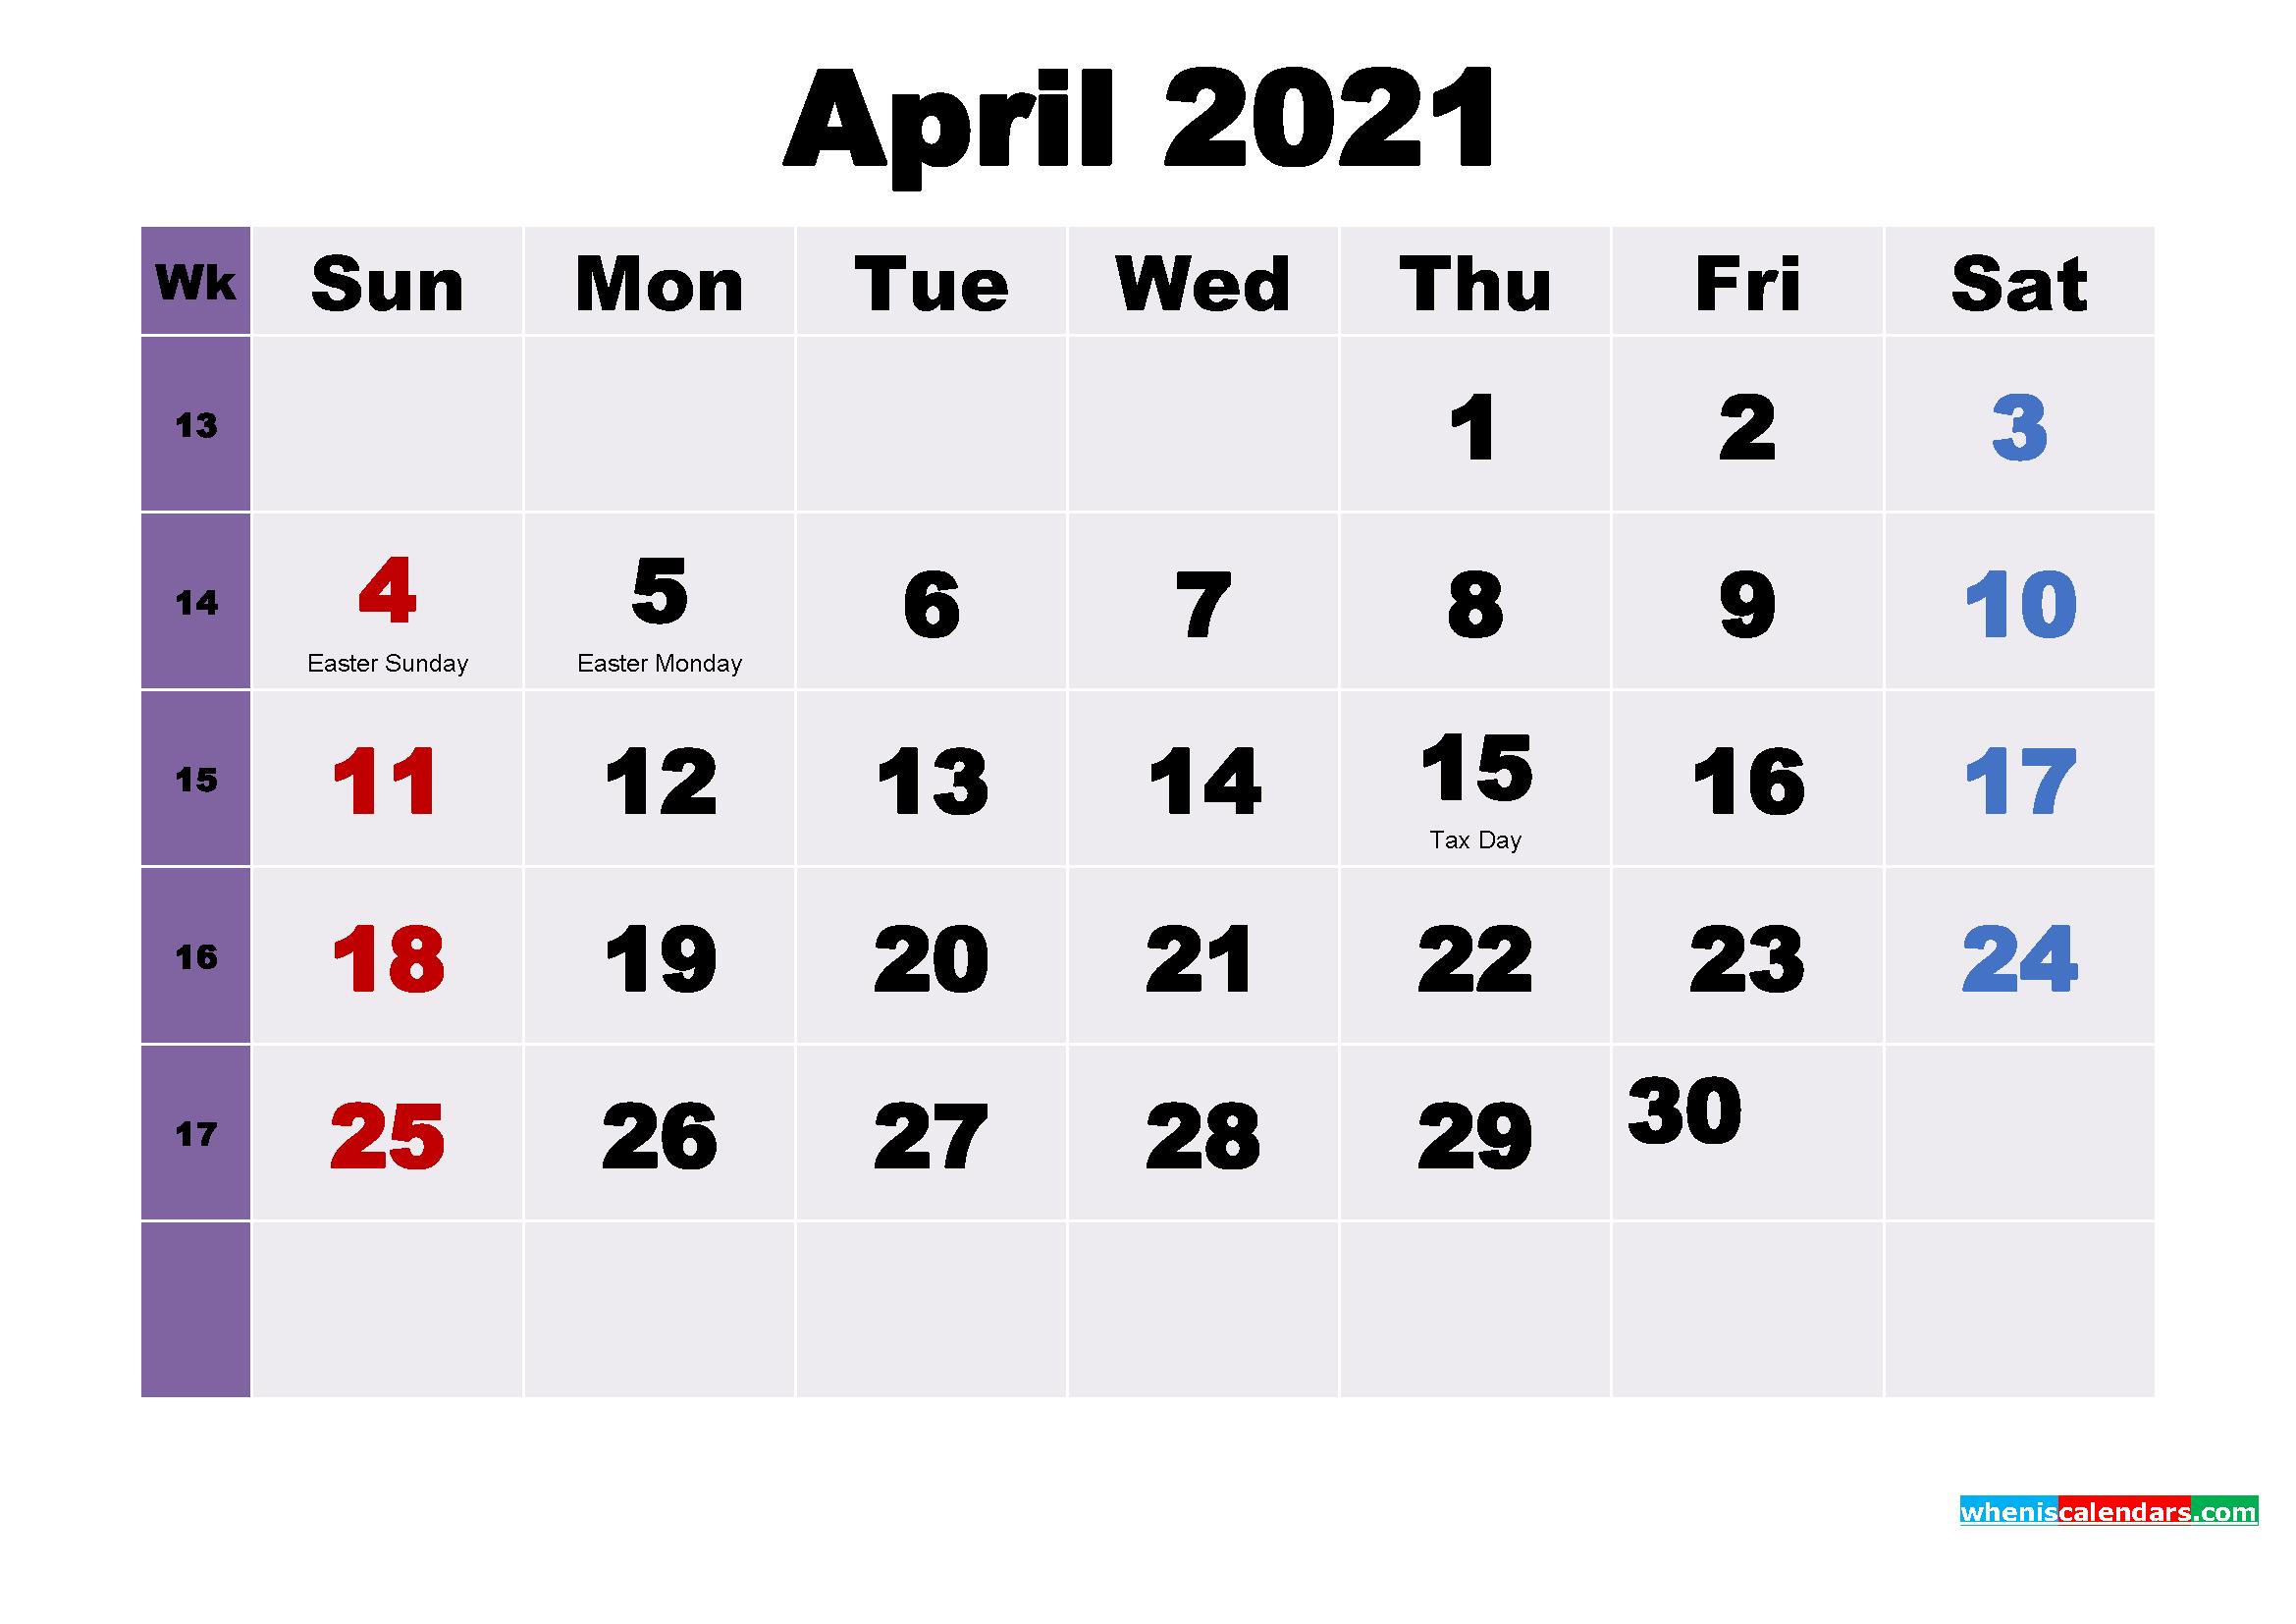 April 2021 Desktop Calendar Free Download